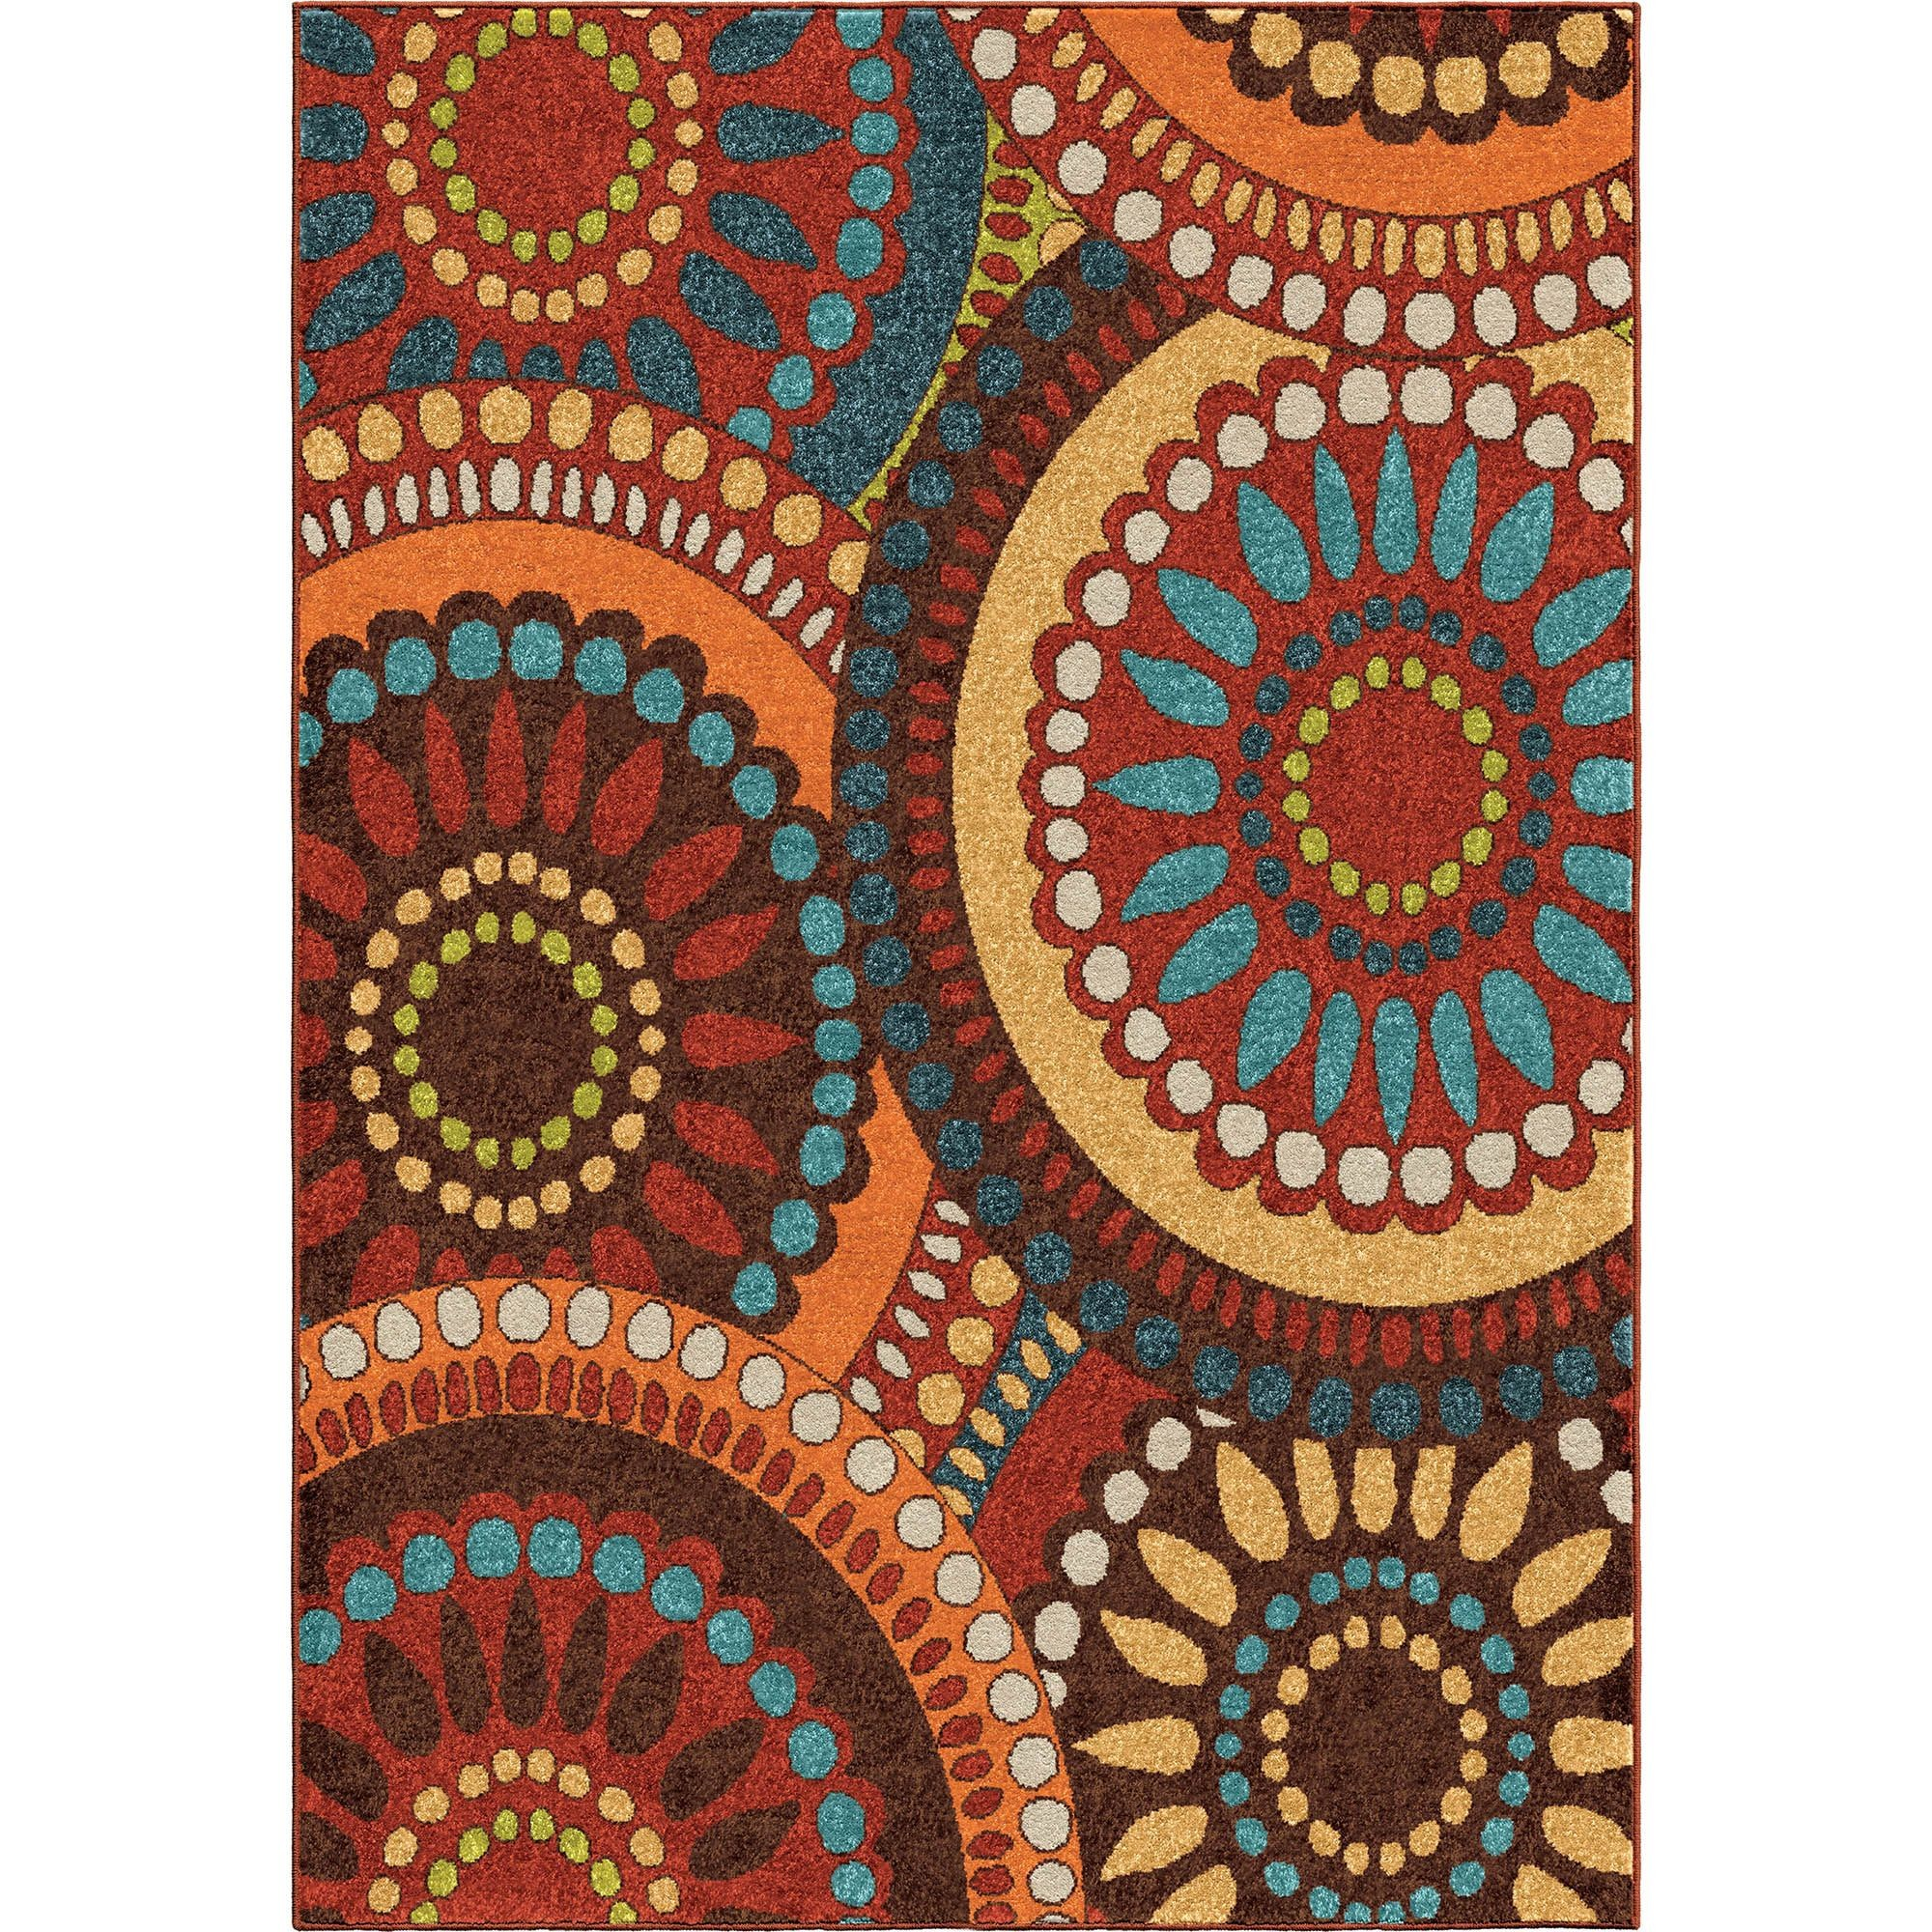 Merrifield Collage Multi Medium Rug From Orian 2321 5x8